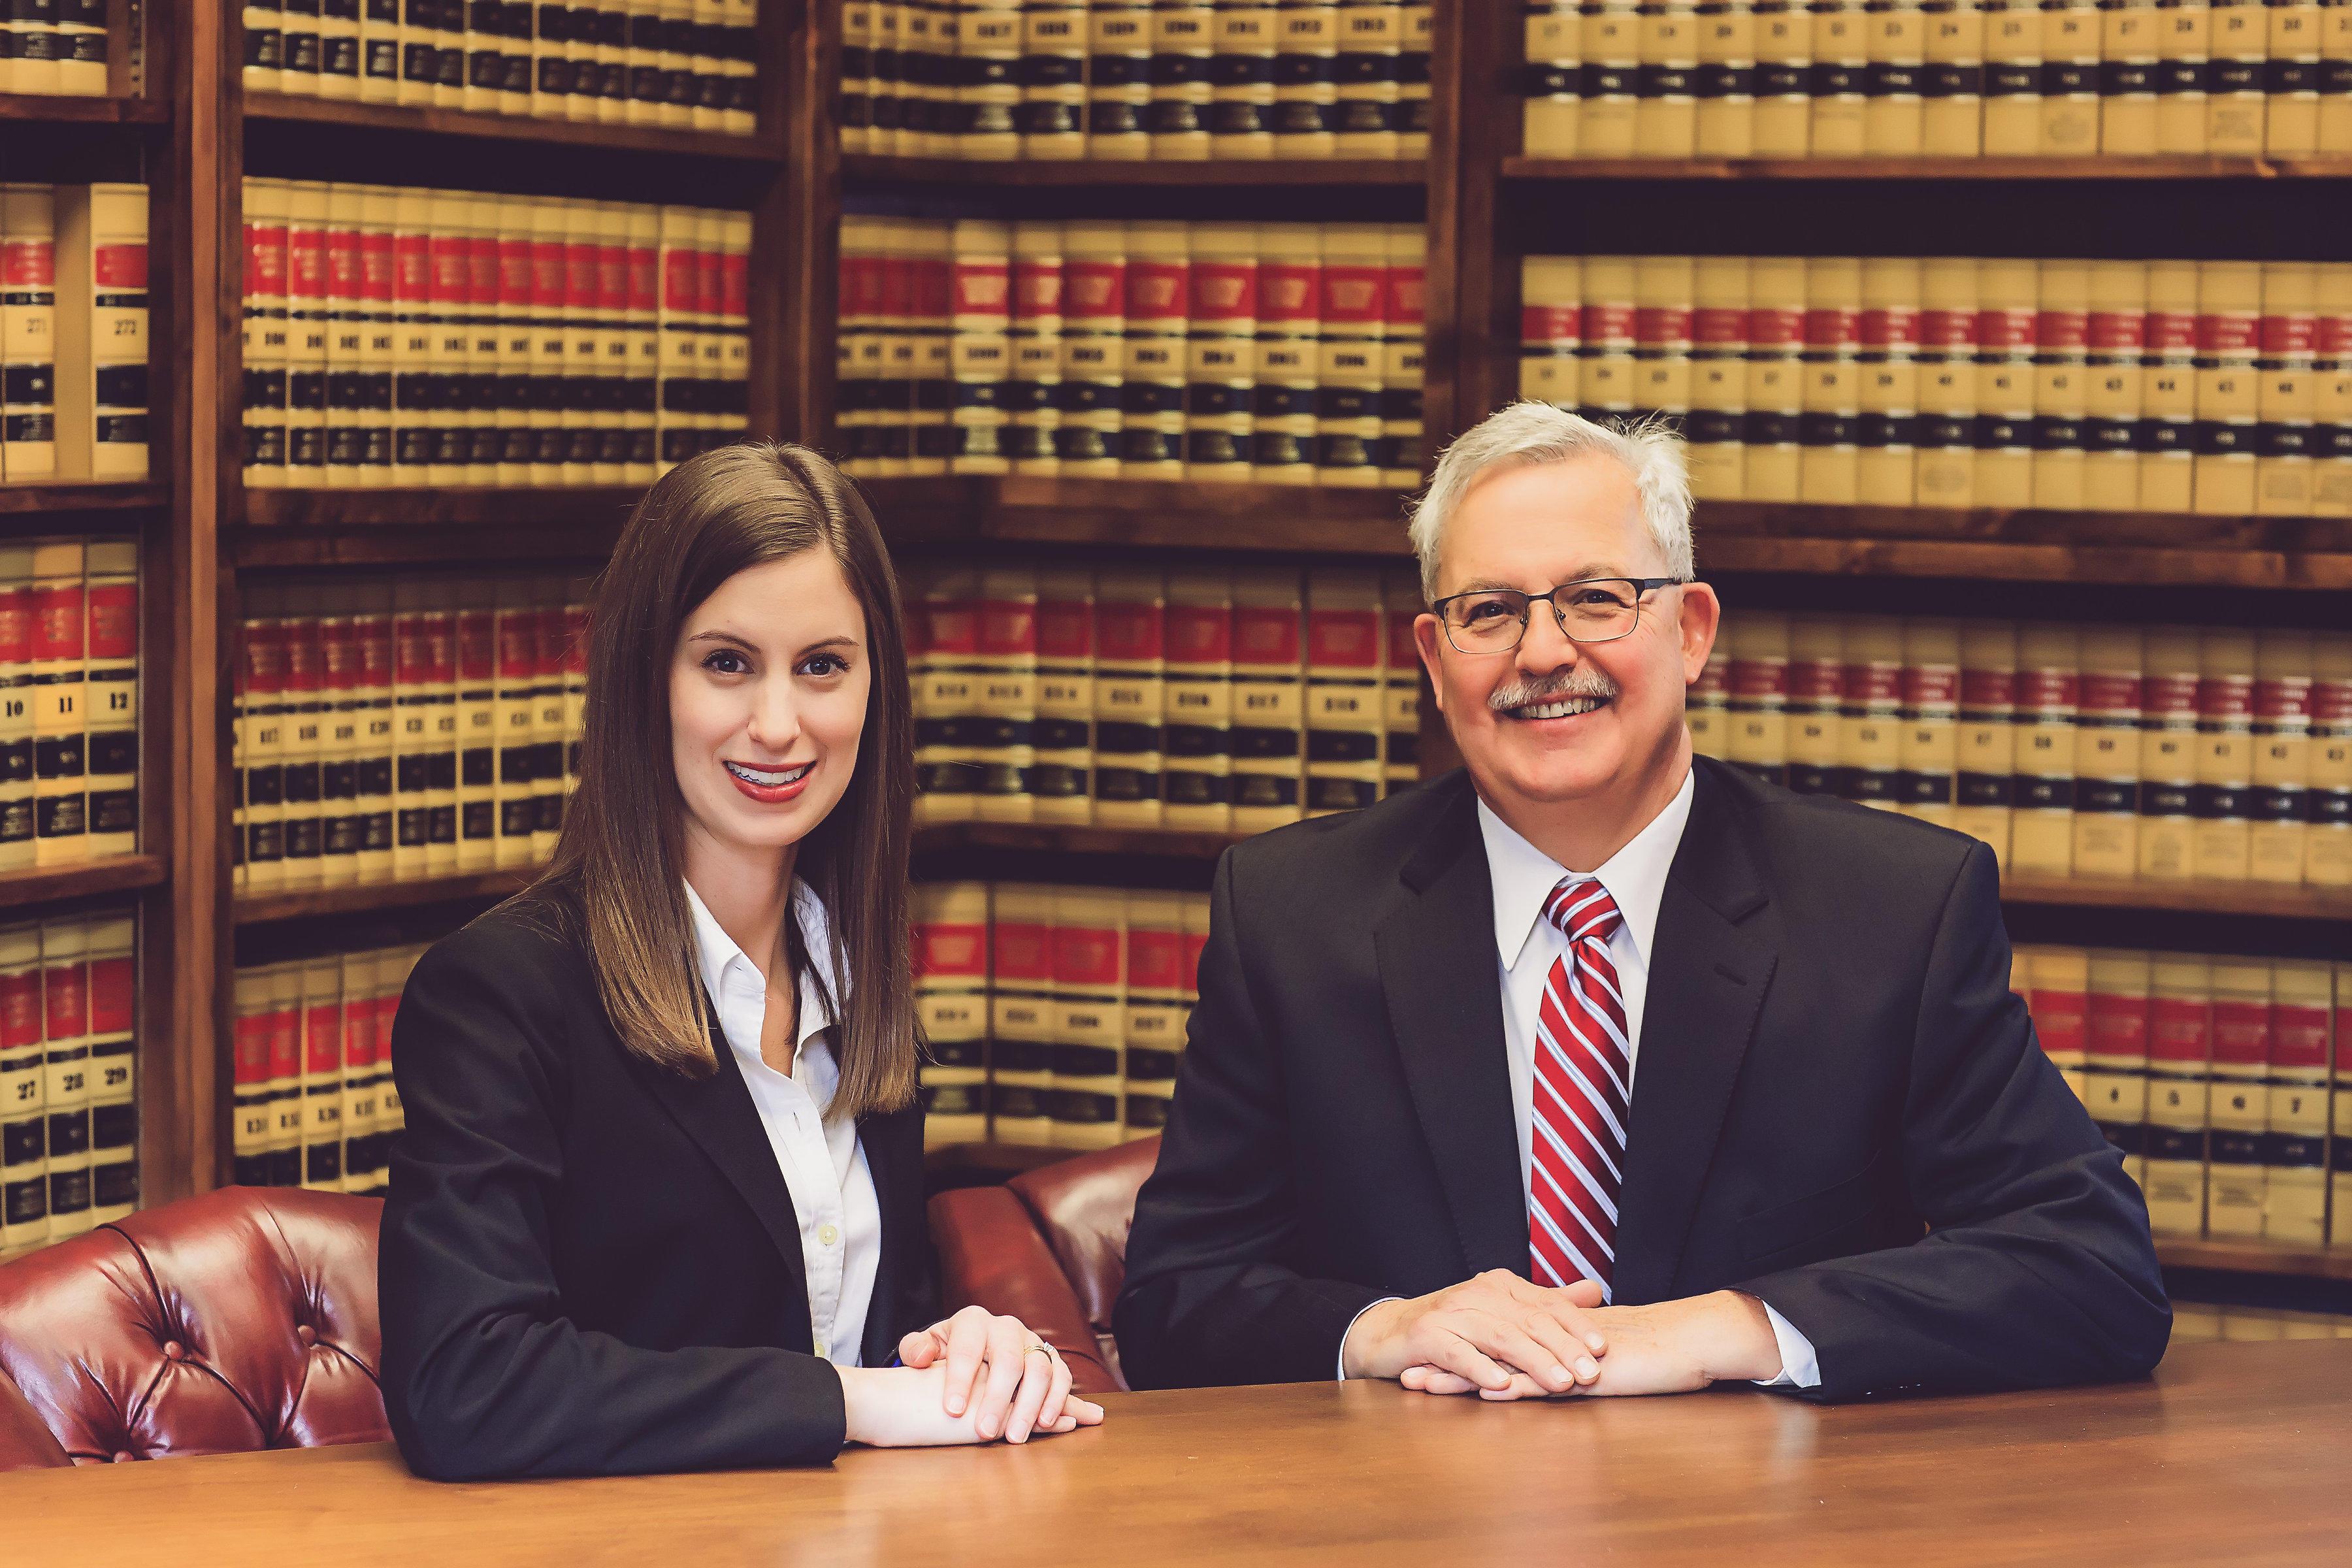 Austin & Austin Attorneys At Law image 0